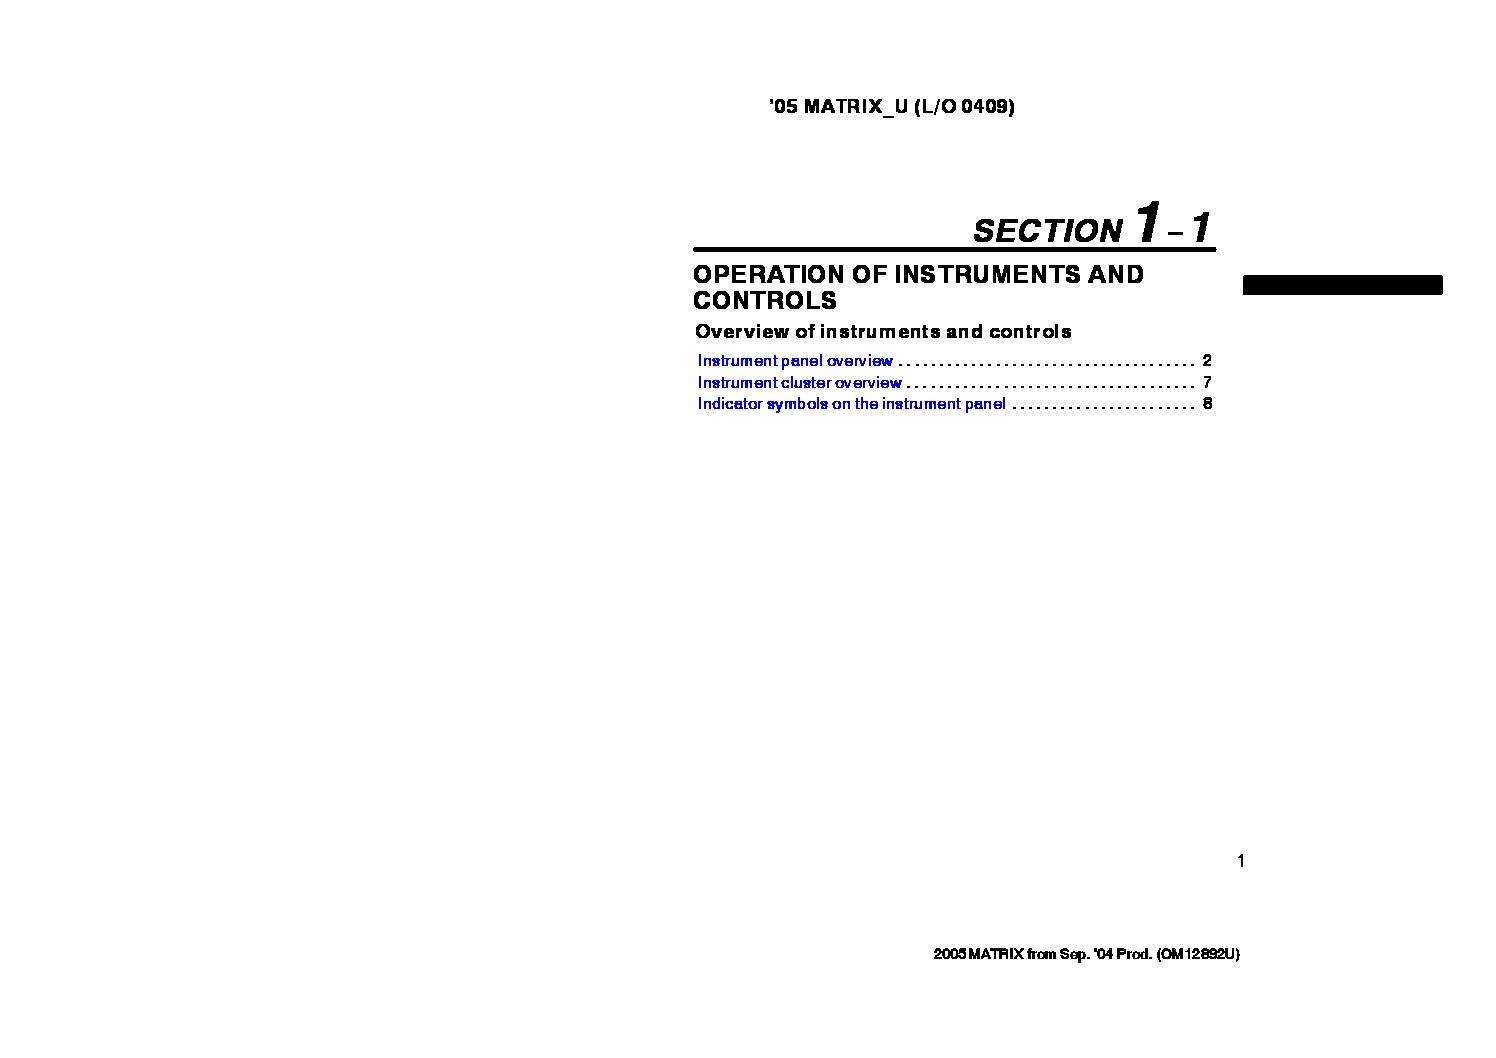 2005 Toyota Matrix Owner's Manual Image